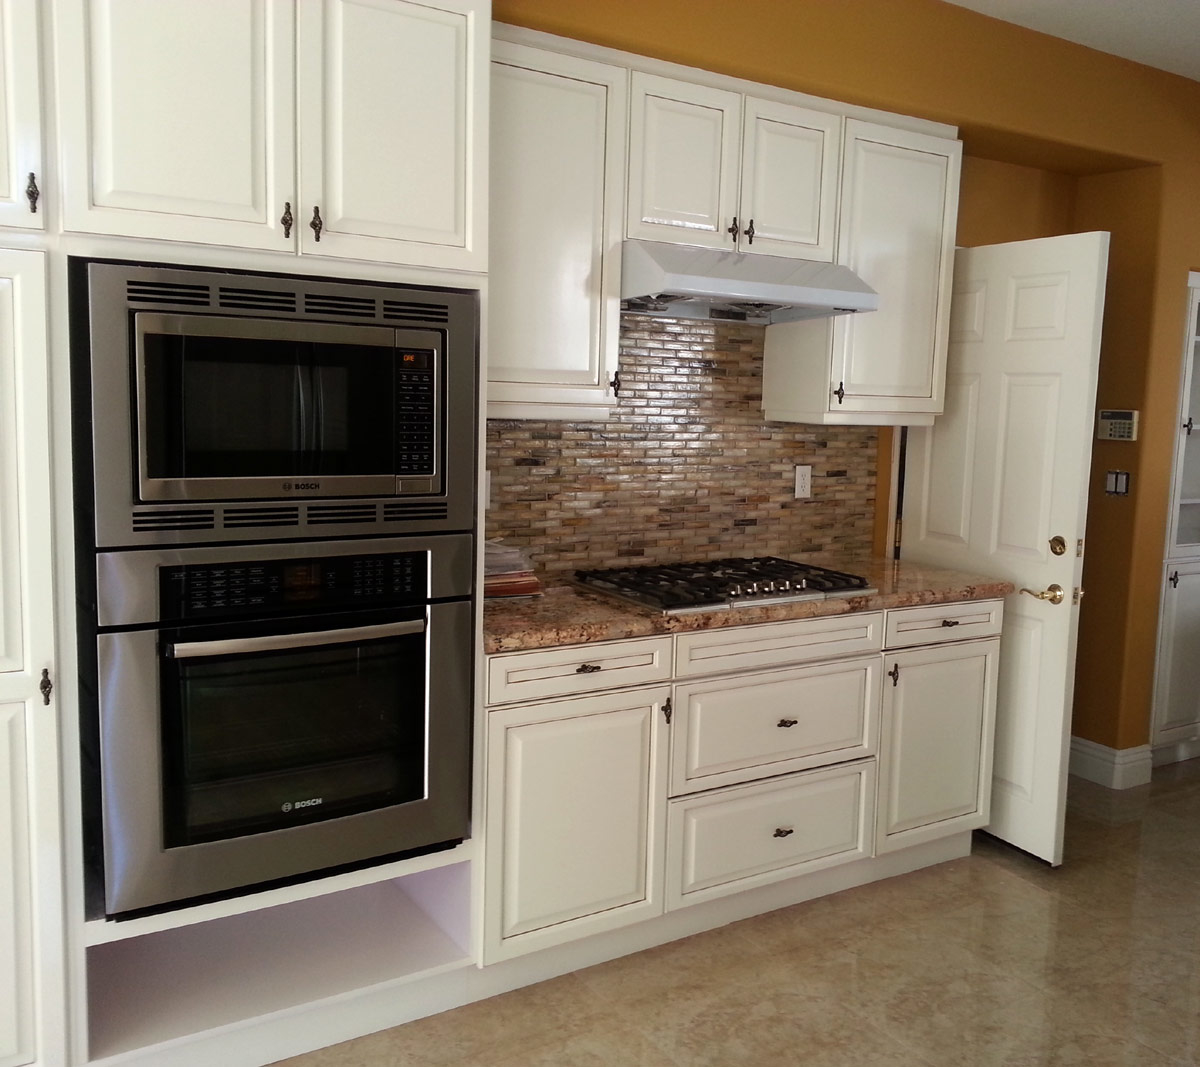 California Kitchen And Bath Cabinet Inc., Santa Ana California